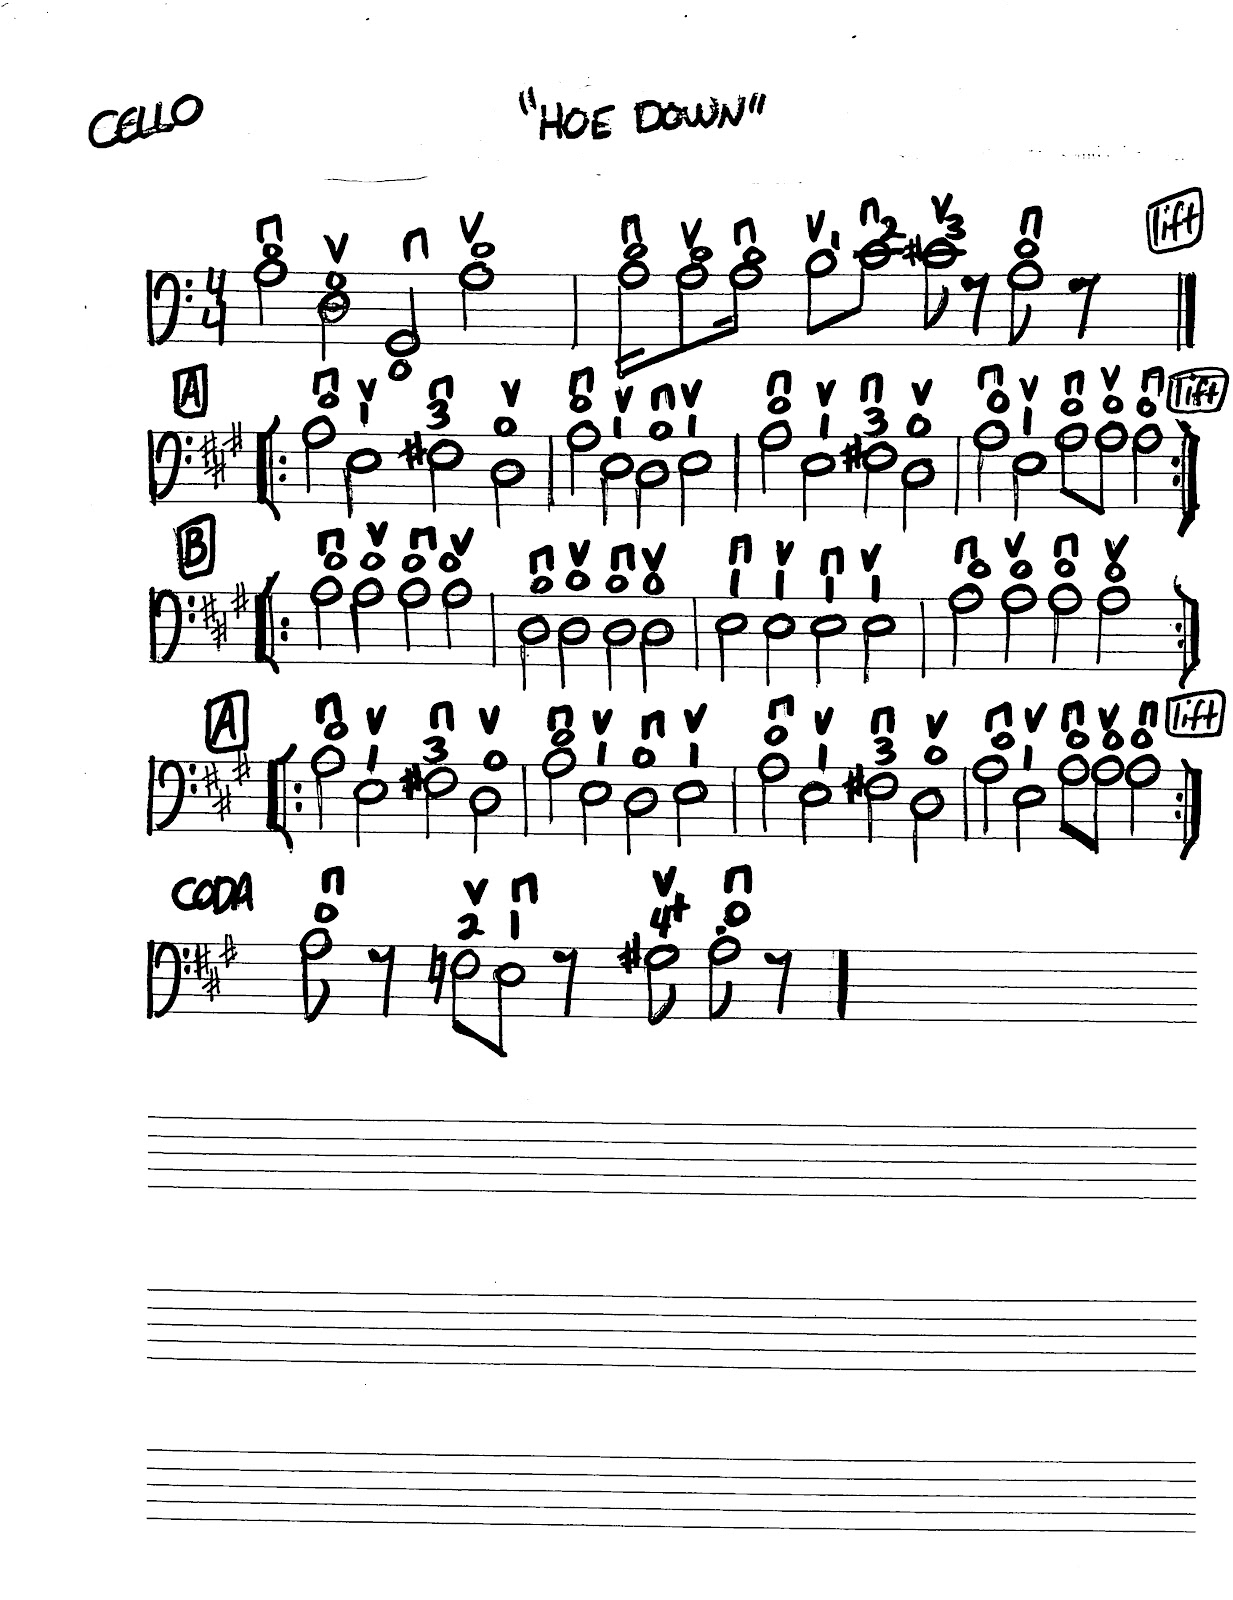 Miss Jacobson's Music: HOEDOWN MUSIC WORKSHEET REVISED